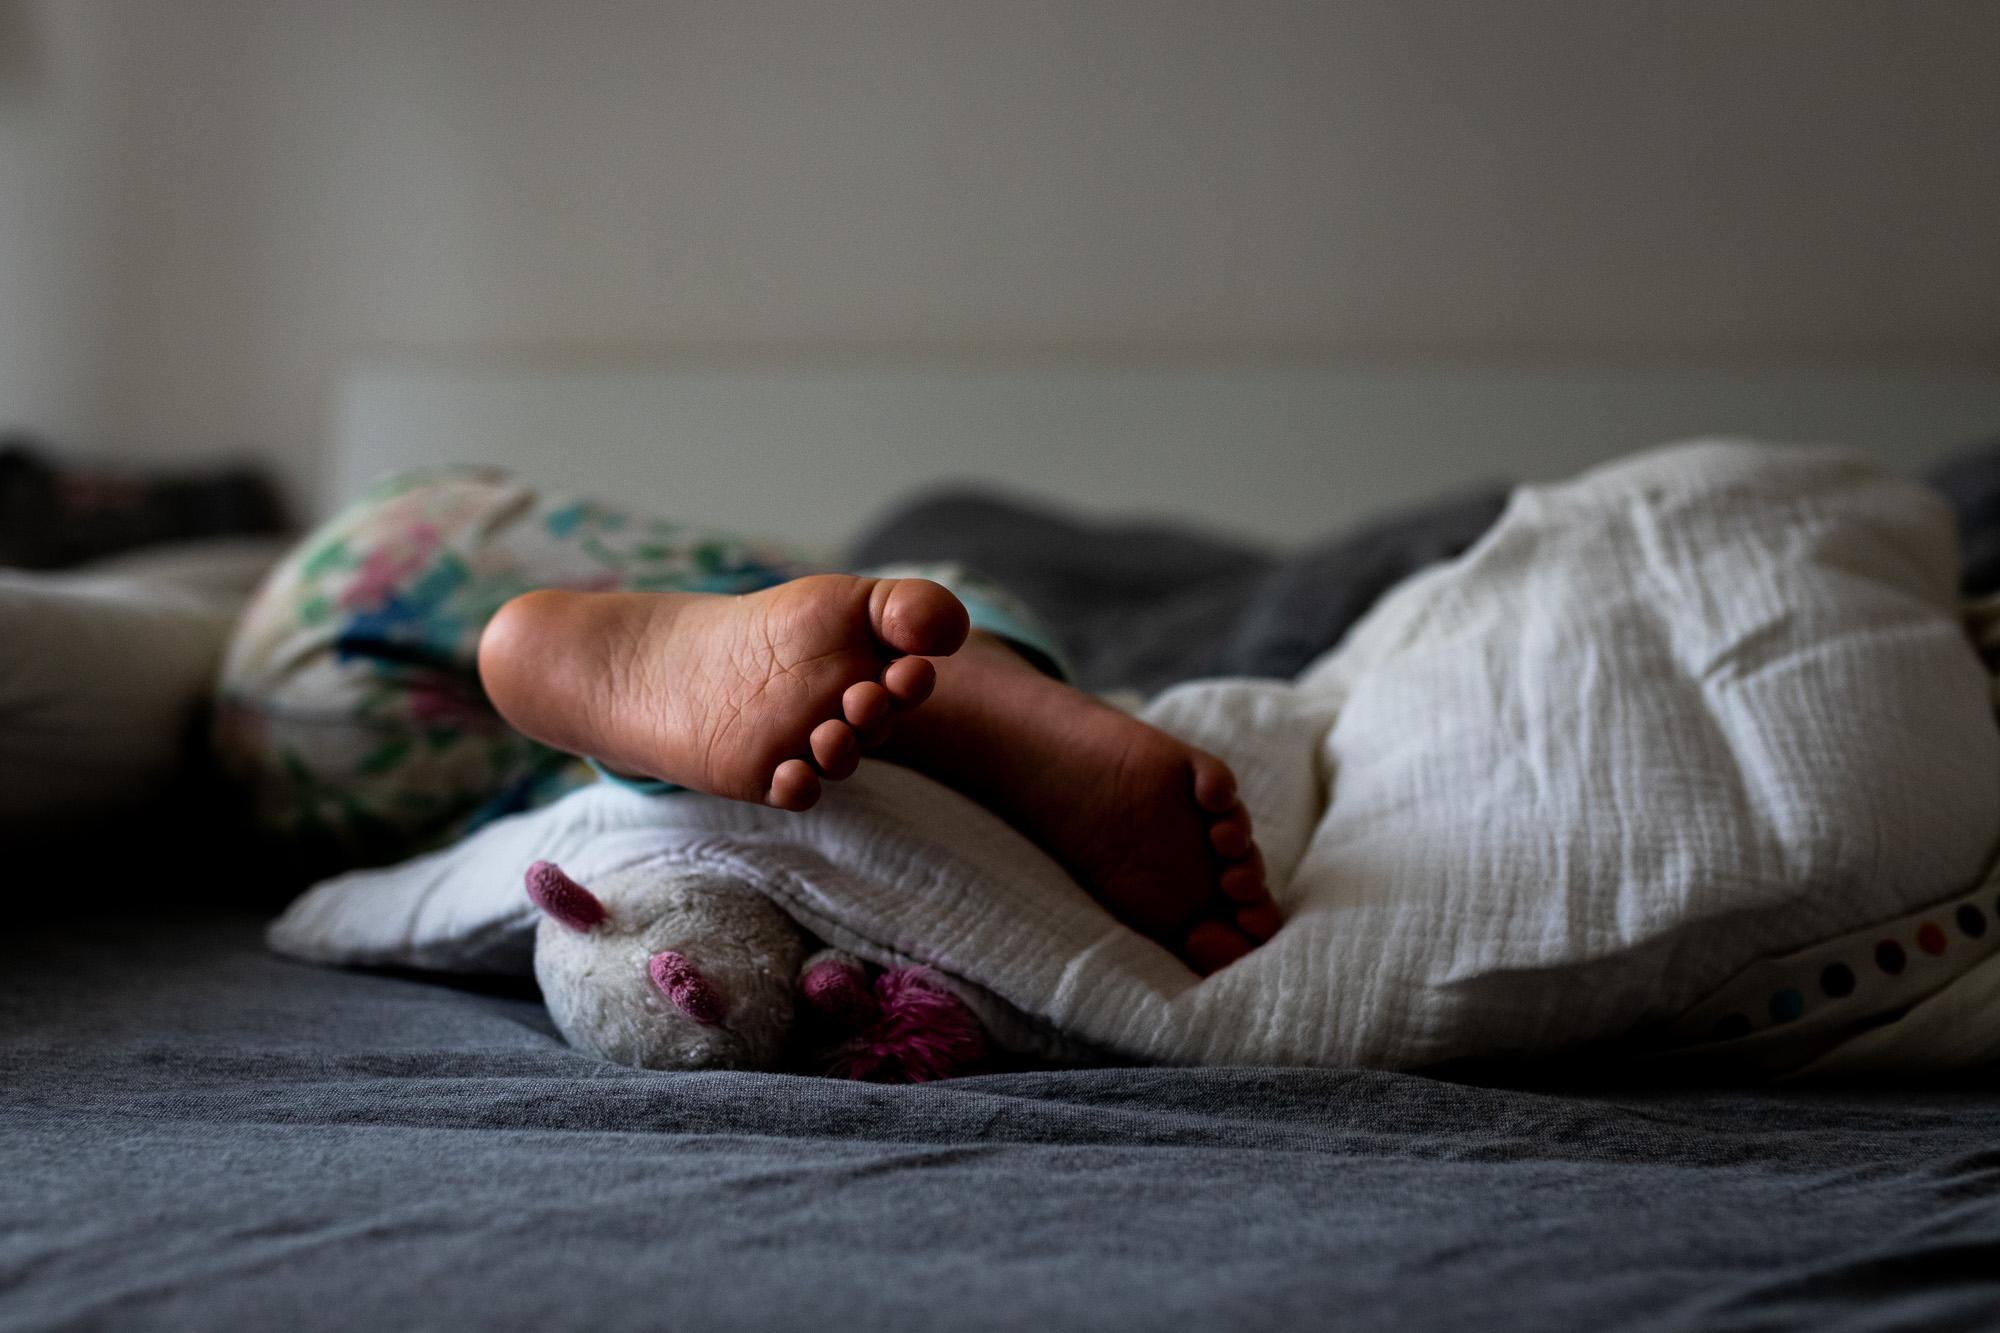 Familienbild. Kinderfüße im Bett.